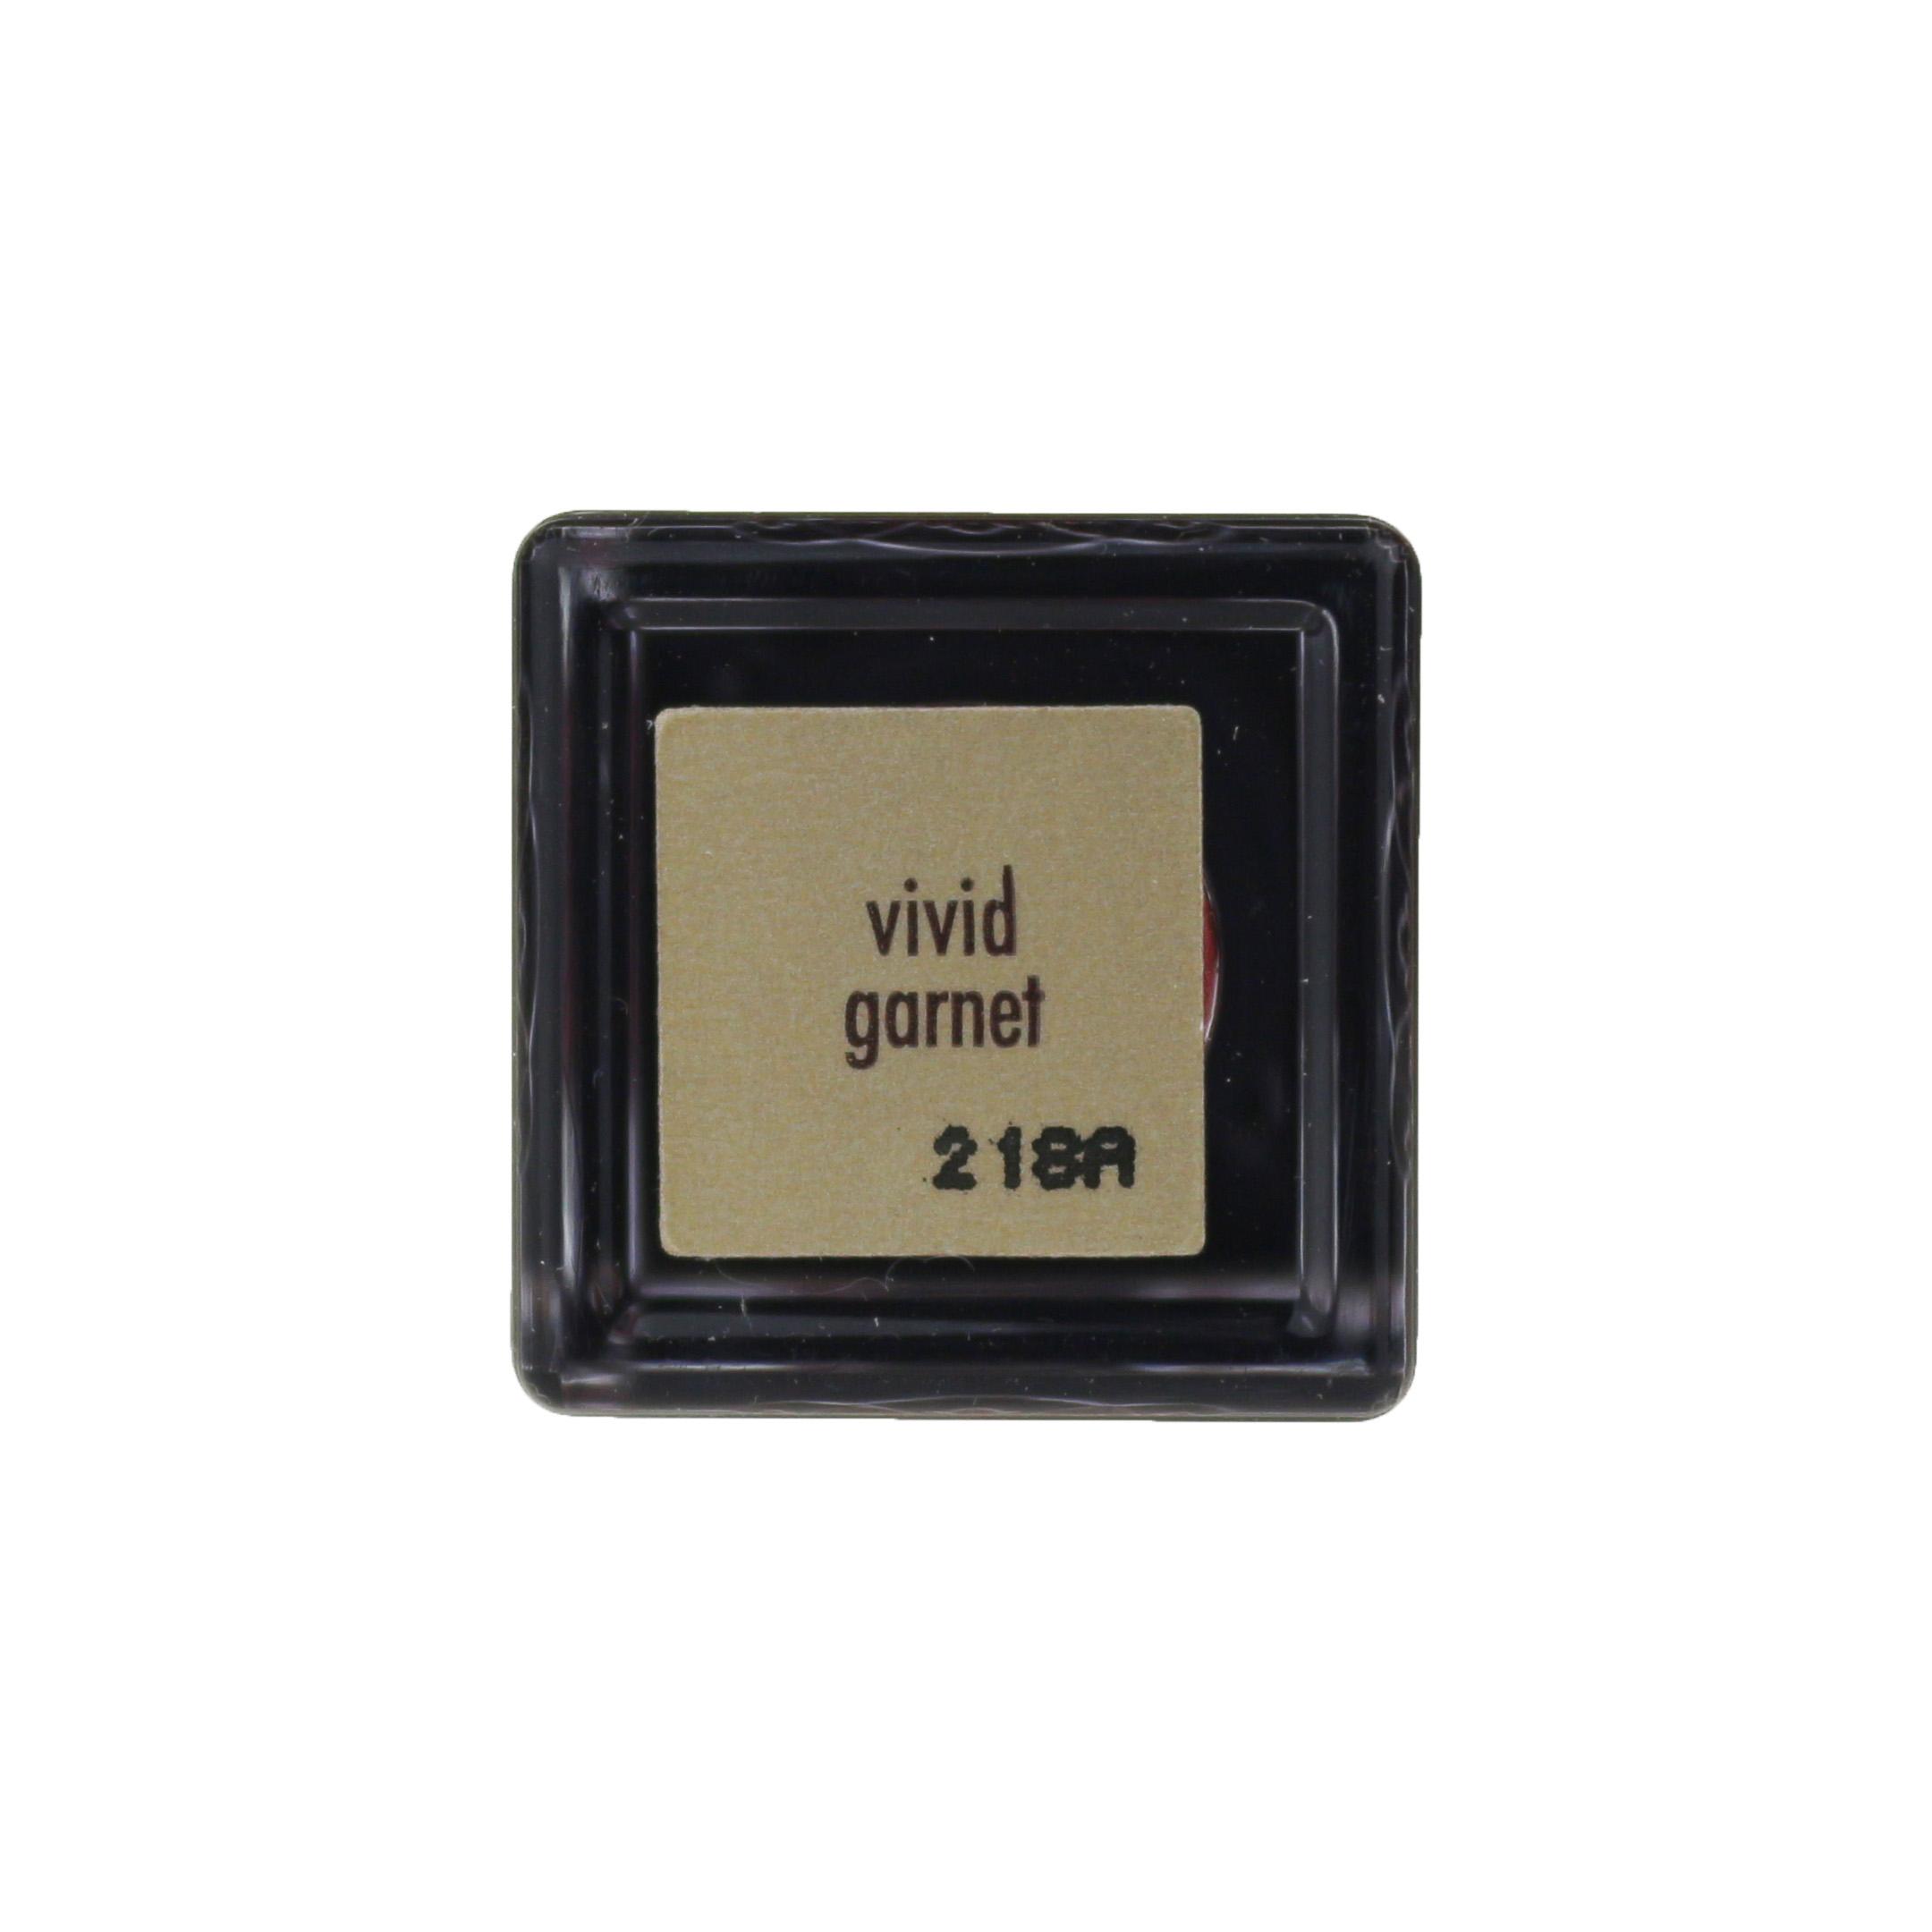 Stila-Shimmer-amp-Glow-Liquid-Eye-Shadow-4-5ml-New-In-Box-Choose-Your-Shade thumbnail 19